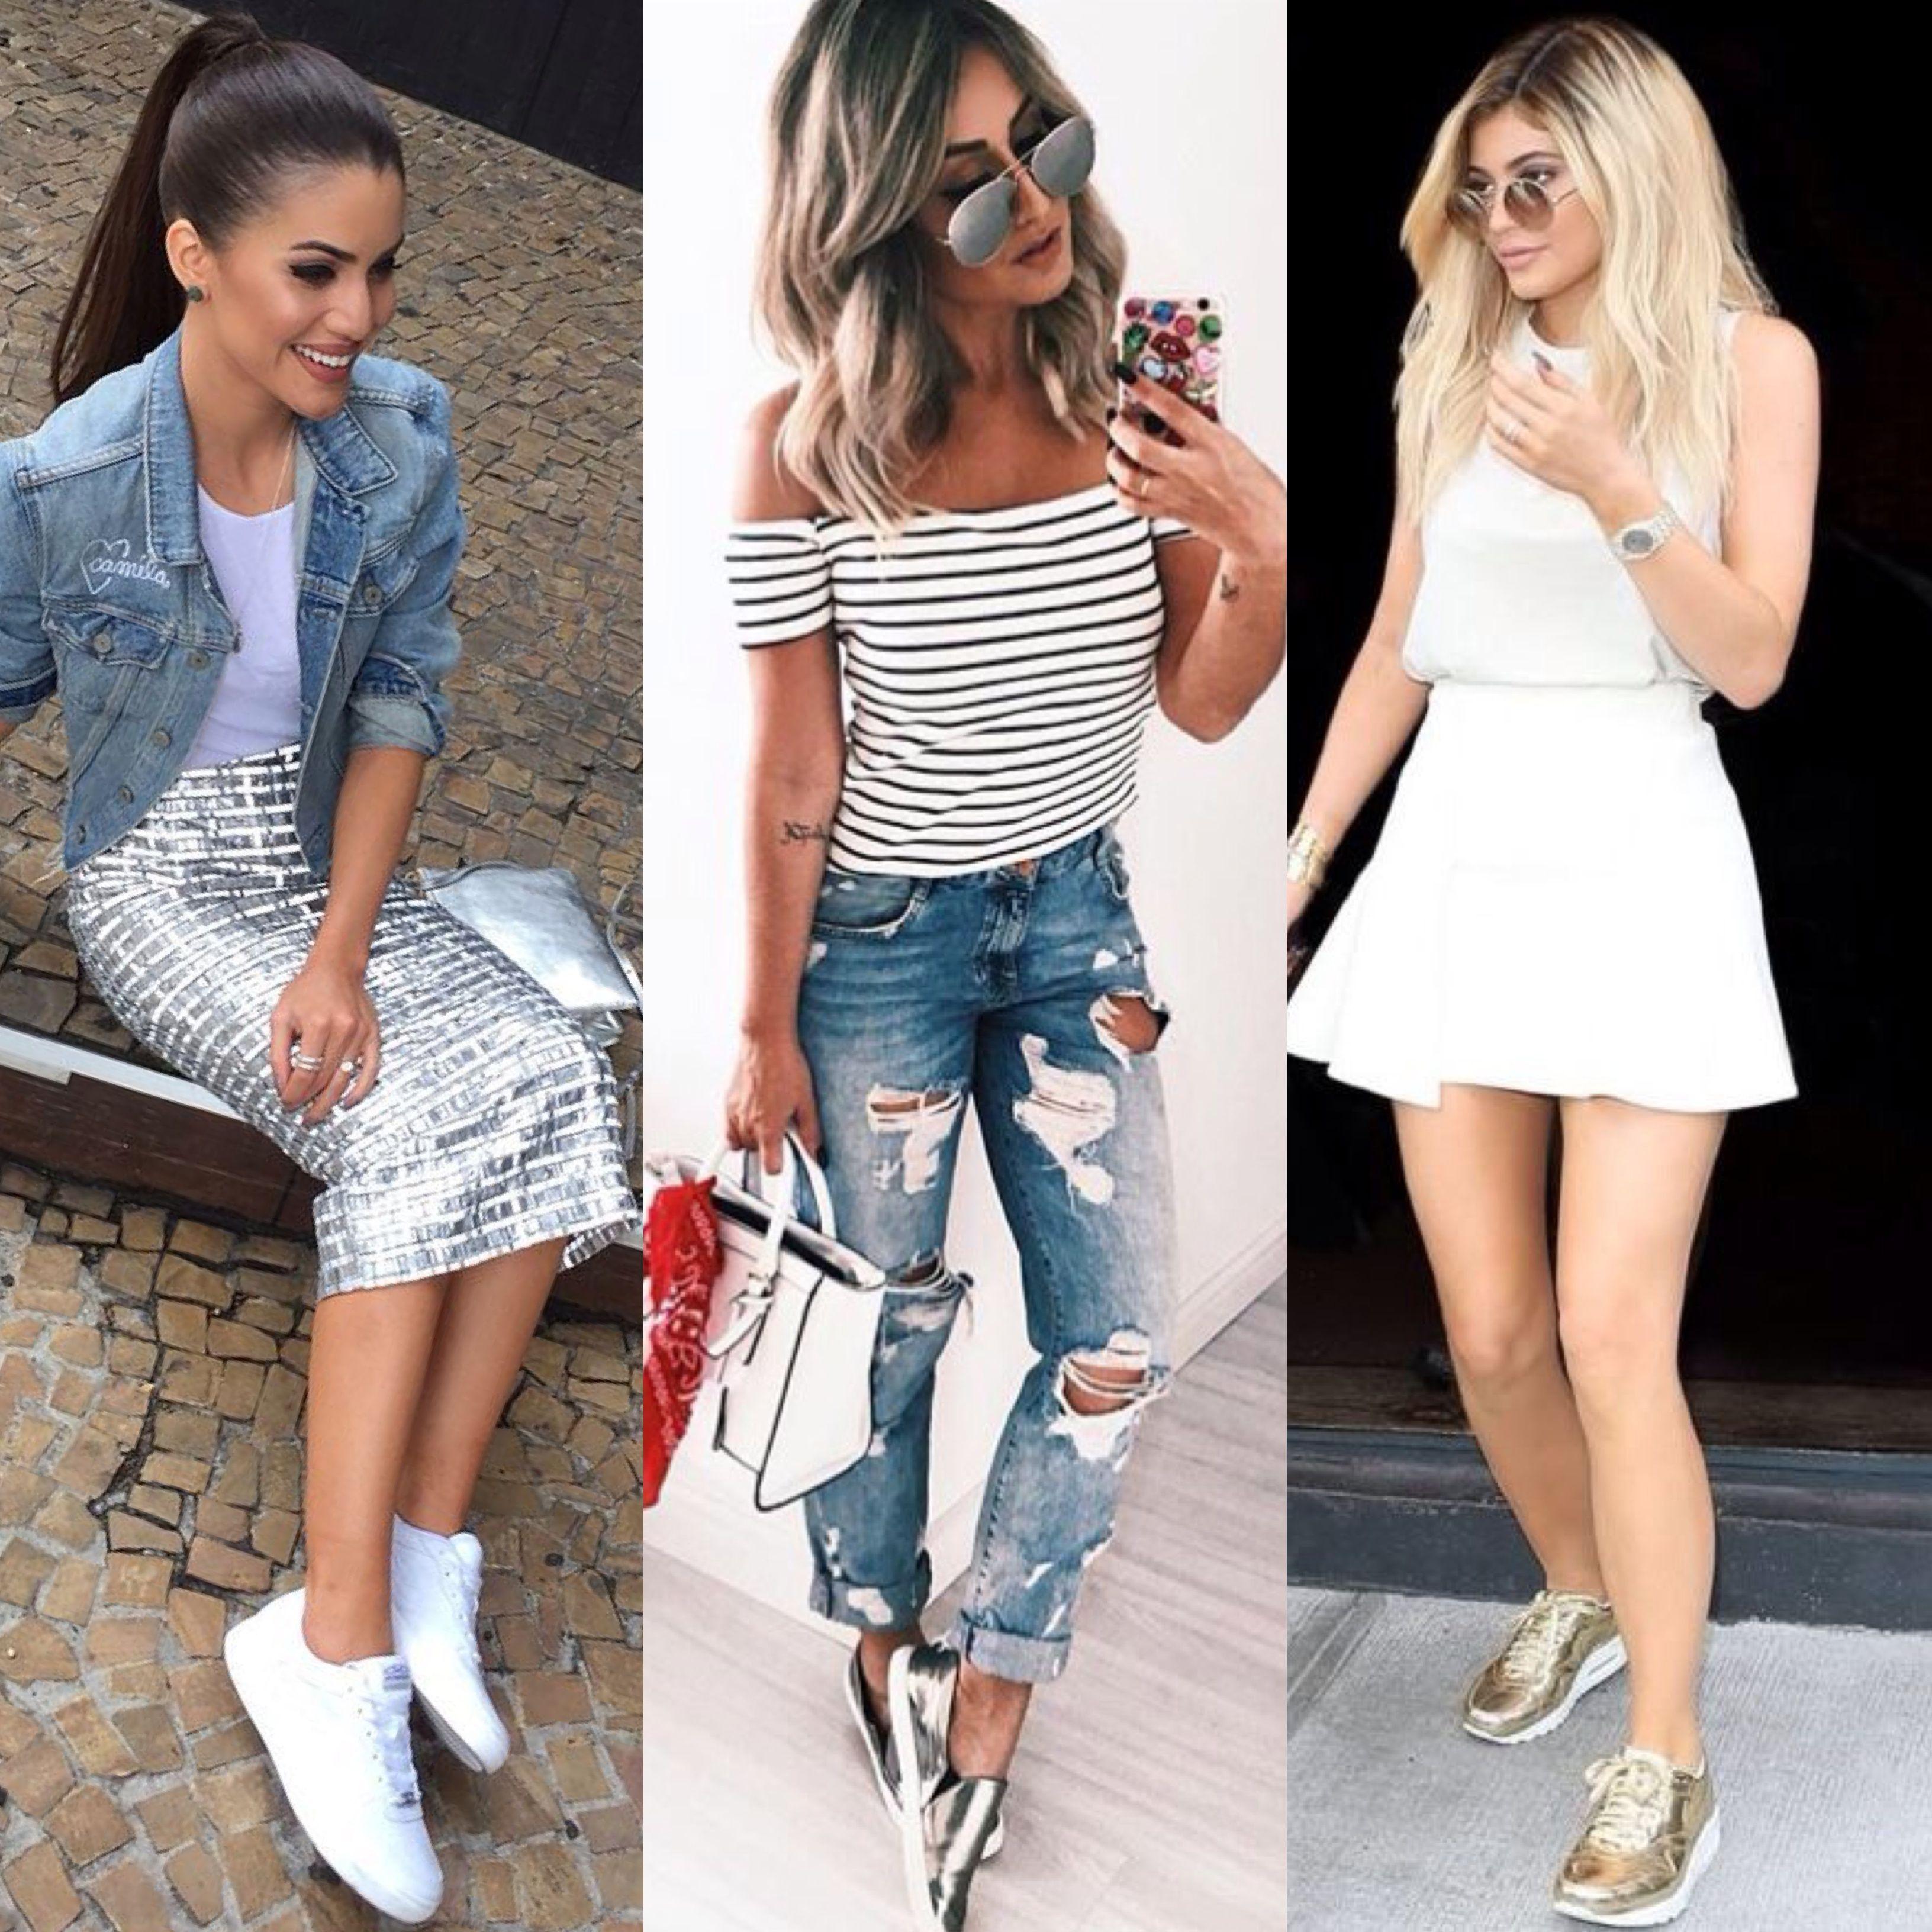 d79abf17424 tendência metalizado saia lápis tênis slip on sneakers skirt look moda  fashion gold silver dourado prata mettalized